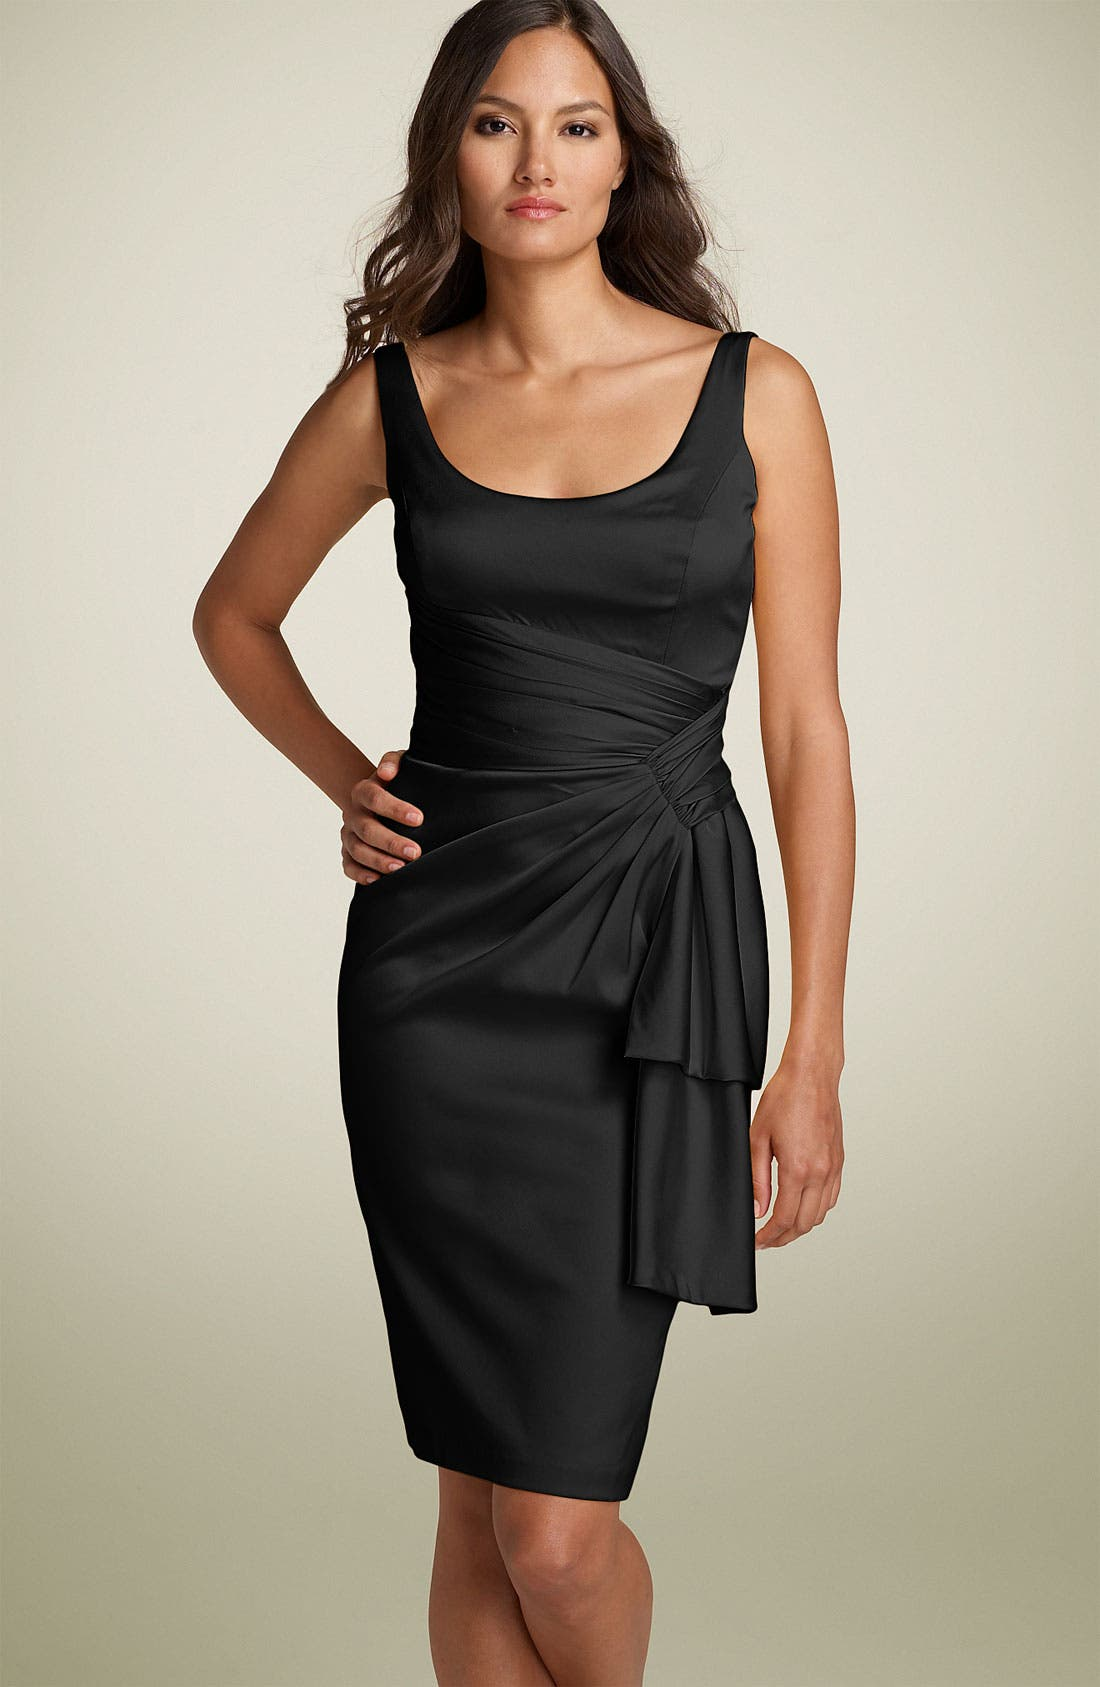 MAGGY LONDON Sleeveless Stretch Satin Sheath Dress, Main, color, 001